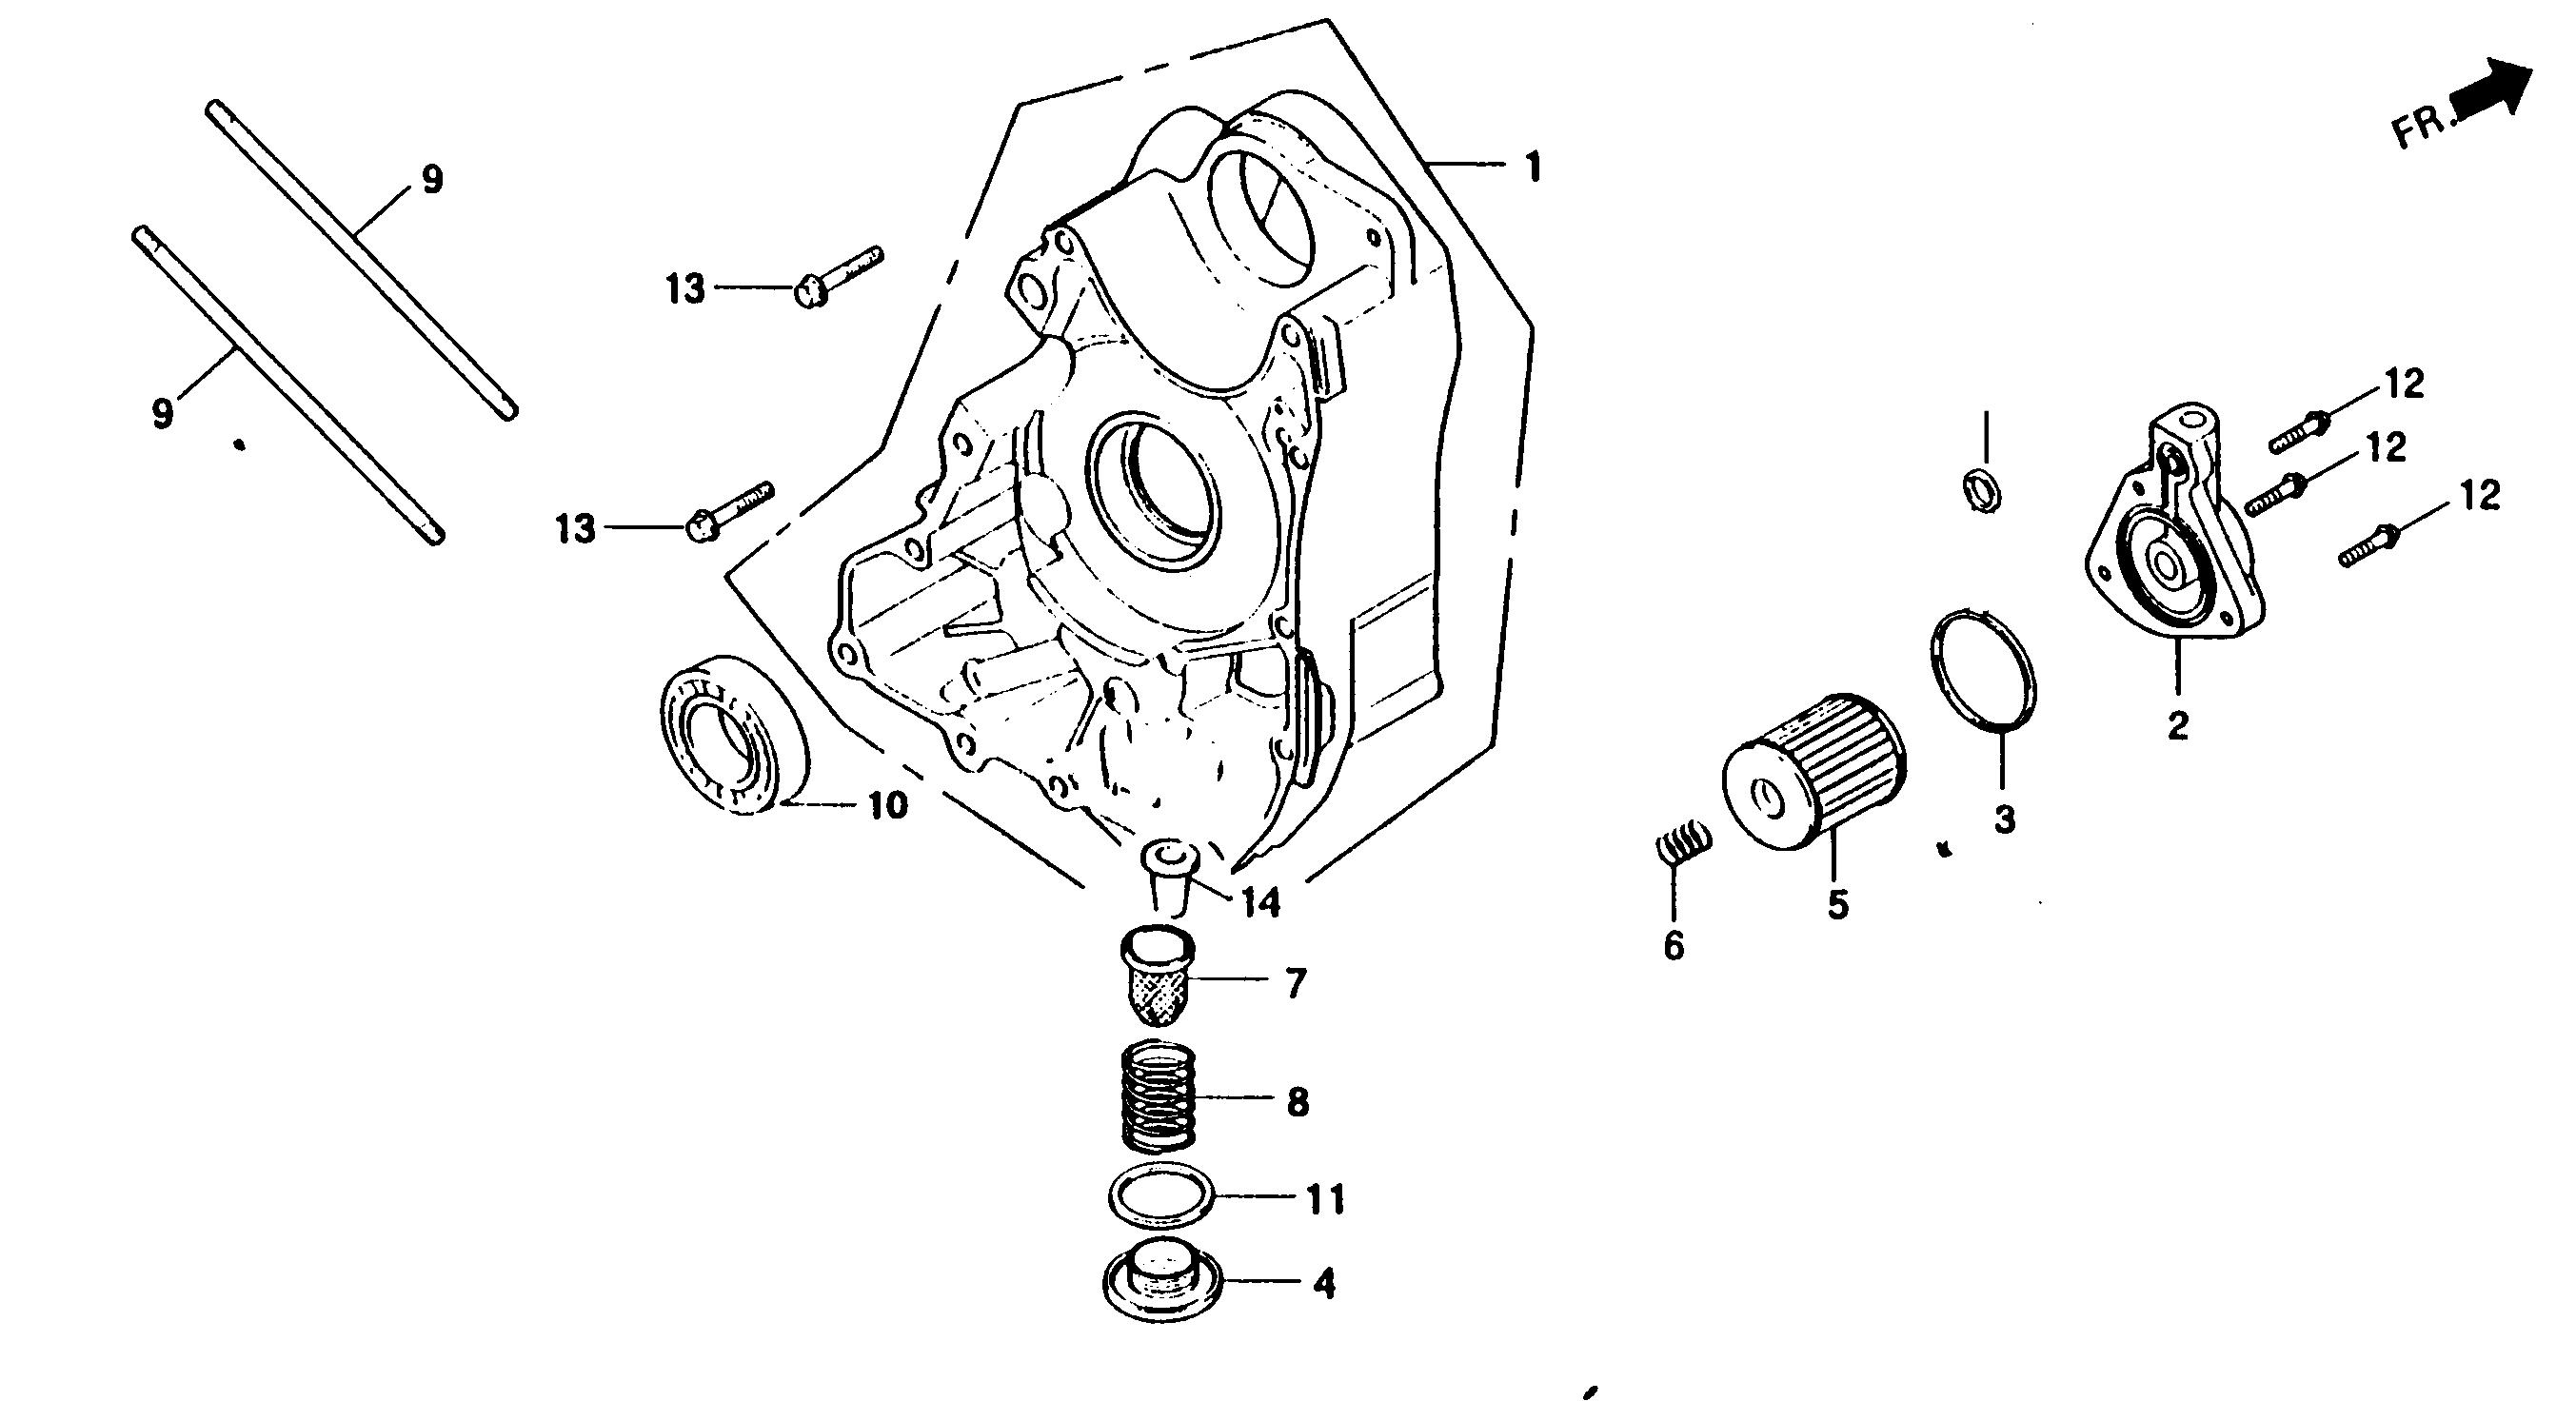 Motorgehäuse rechts, Ölfilter